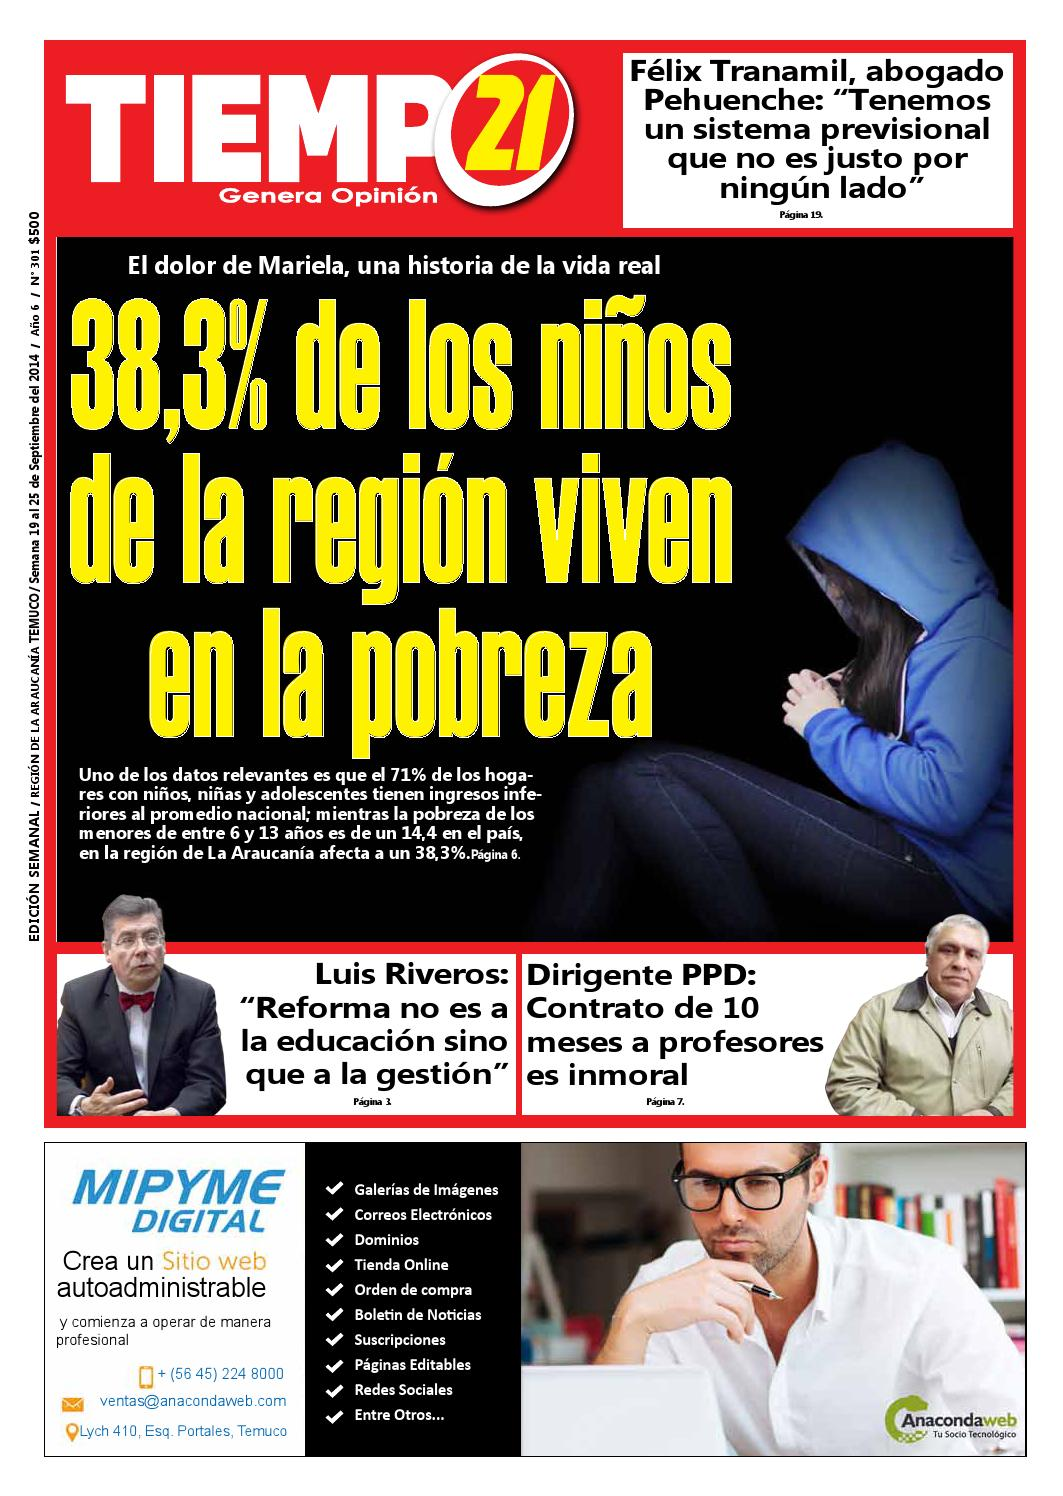 Edici N 301 38 3 De Los Ni Os De La Regi N Viven En La Pobreza  # Muebles Caupolican San Carlos